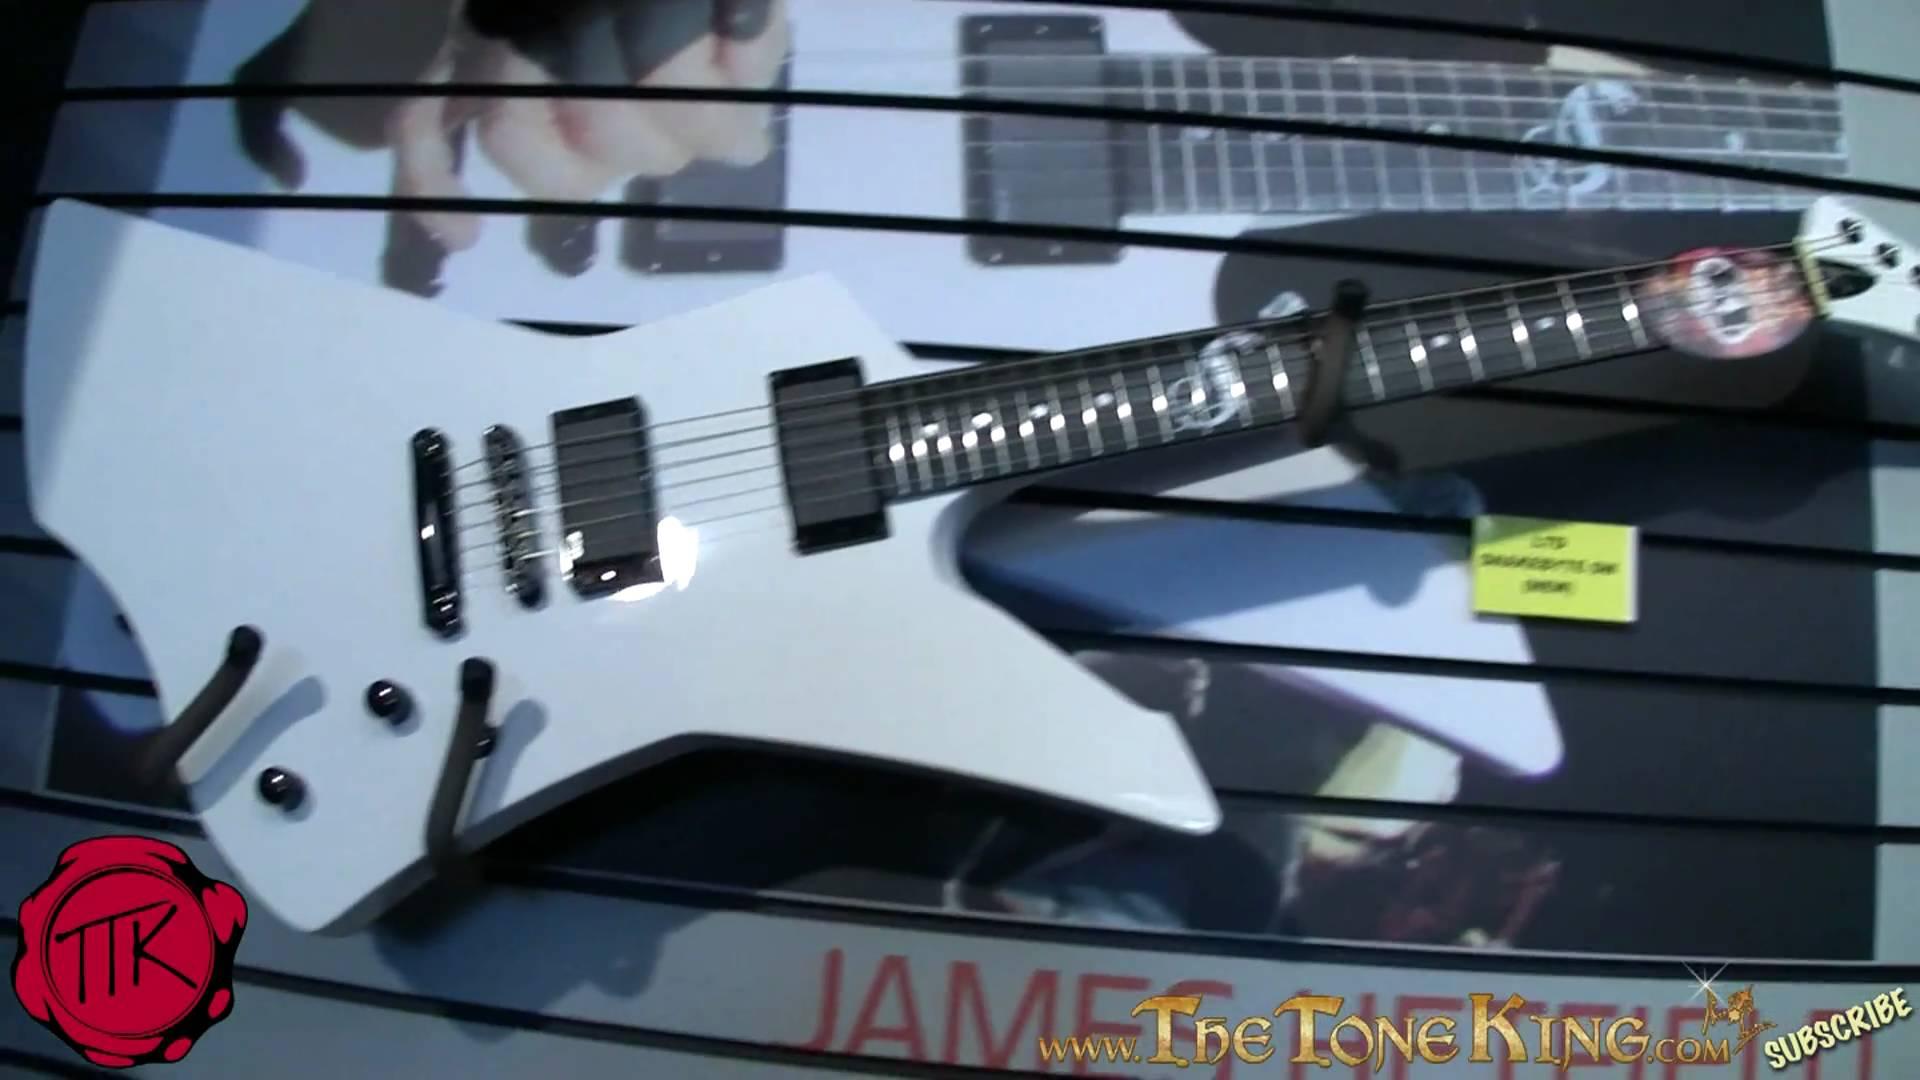 esp ltd snakebyte guitar in hd 1080 metallicas james hetfield new signature series axe 2 youtube thumbnail?fit=1200%2C675&resize=350%2C200 esp ltd kh wiring diagram custom esp kh, esp kh dc, esp kh 4 esp ltd kh 202 wiring diagram at bayanpartner.co